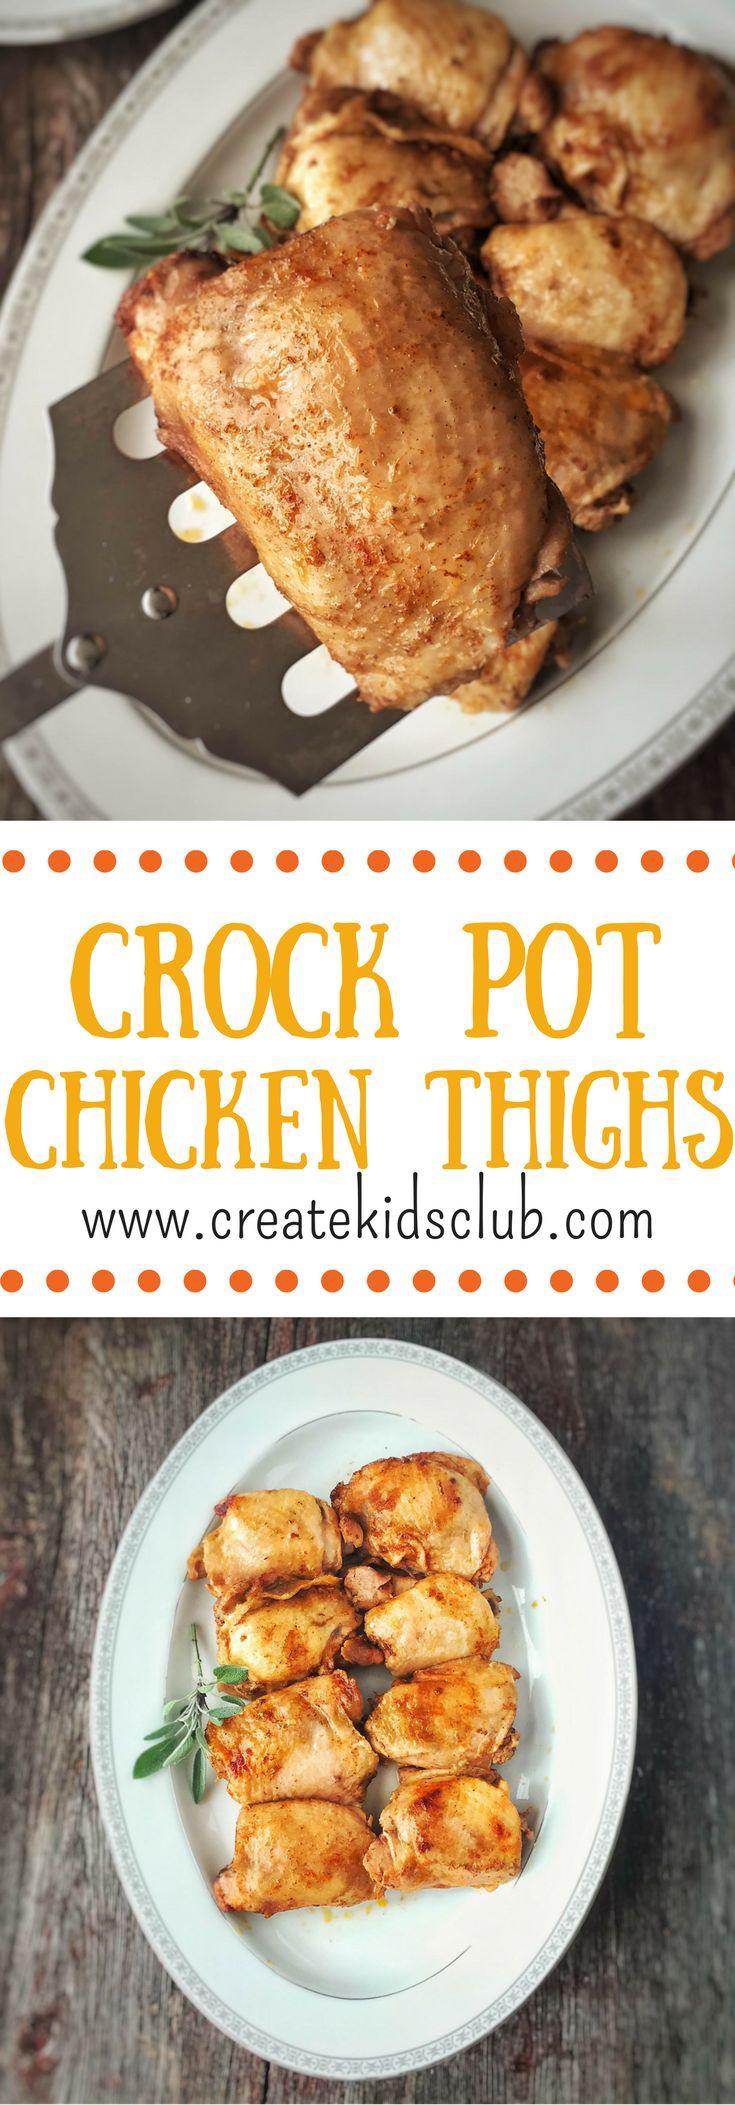 crock pot chicken thighs via createkidsclub.com